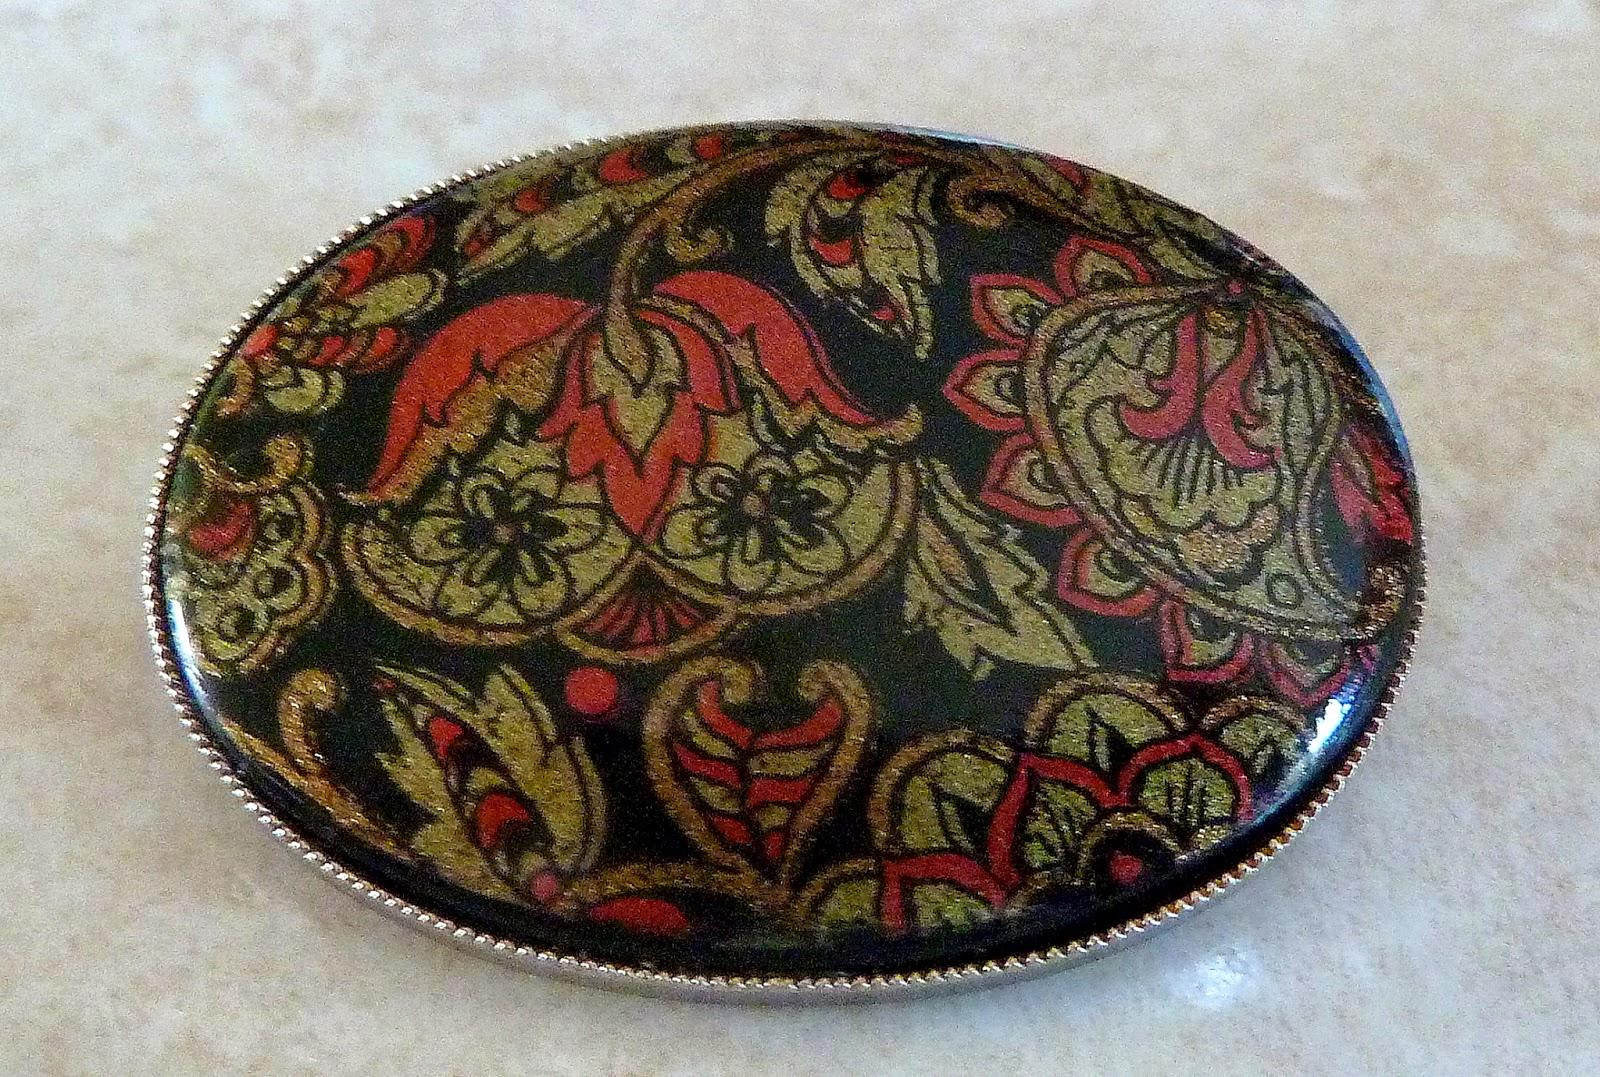 http://www.kcavintagegems.uk/vintage-black-floral-paisley-brooch-403-p.asp